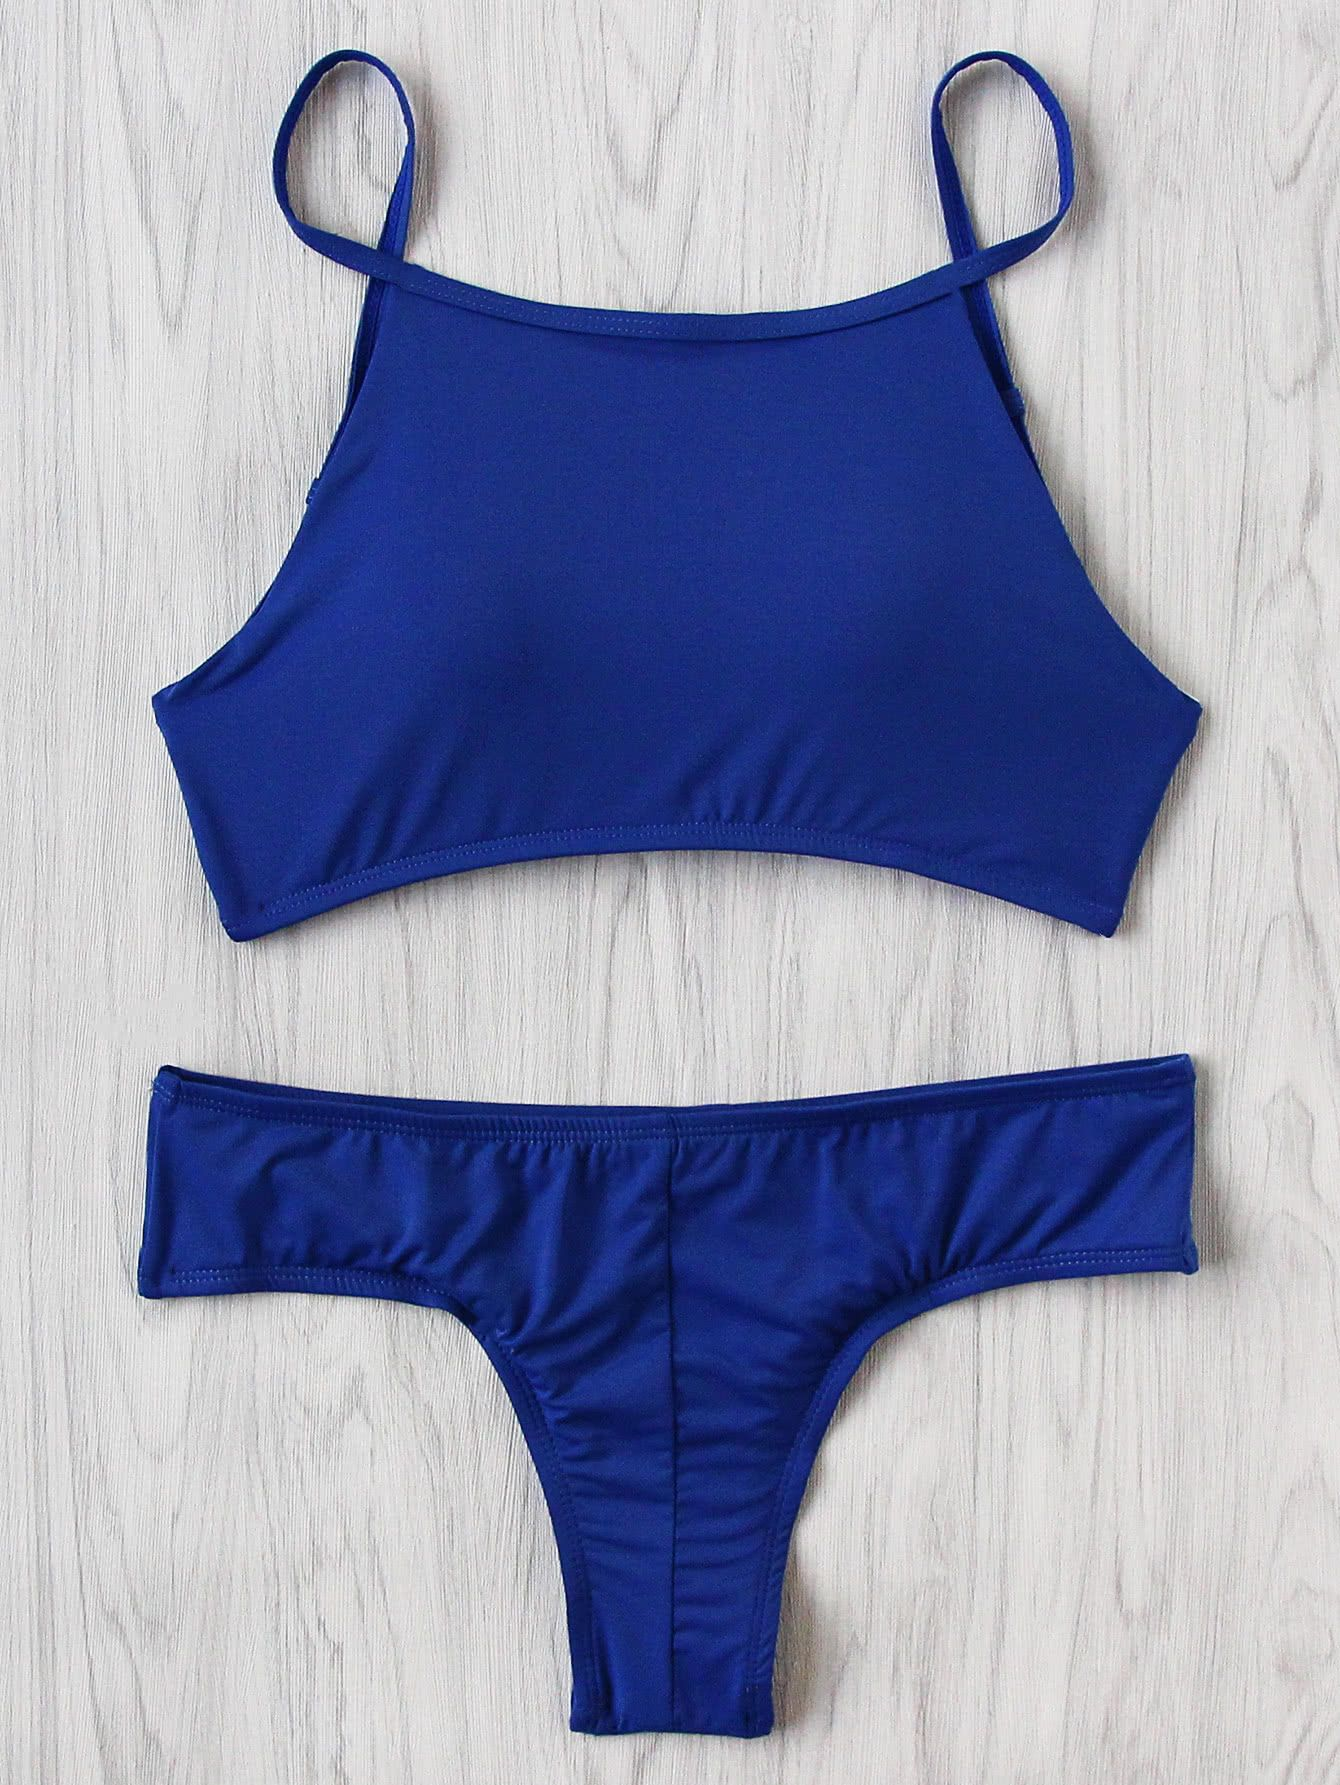 21457fab7 Cómpralo ya!. Strappy Back Bikini Set. Blue Bikinis Vacation Push Up ...